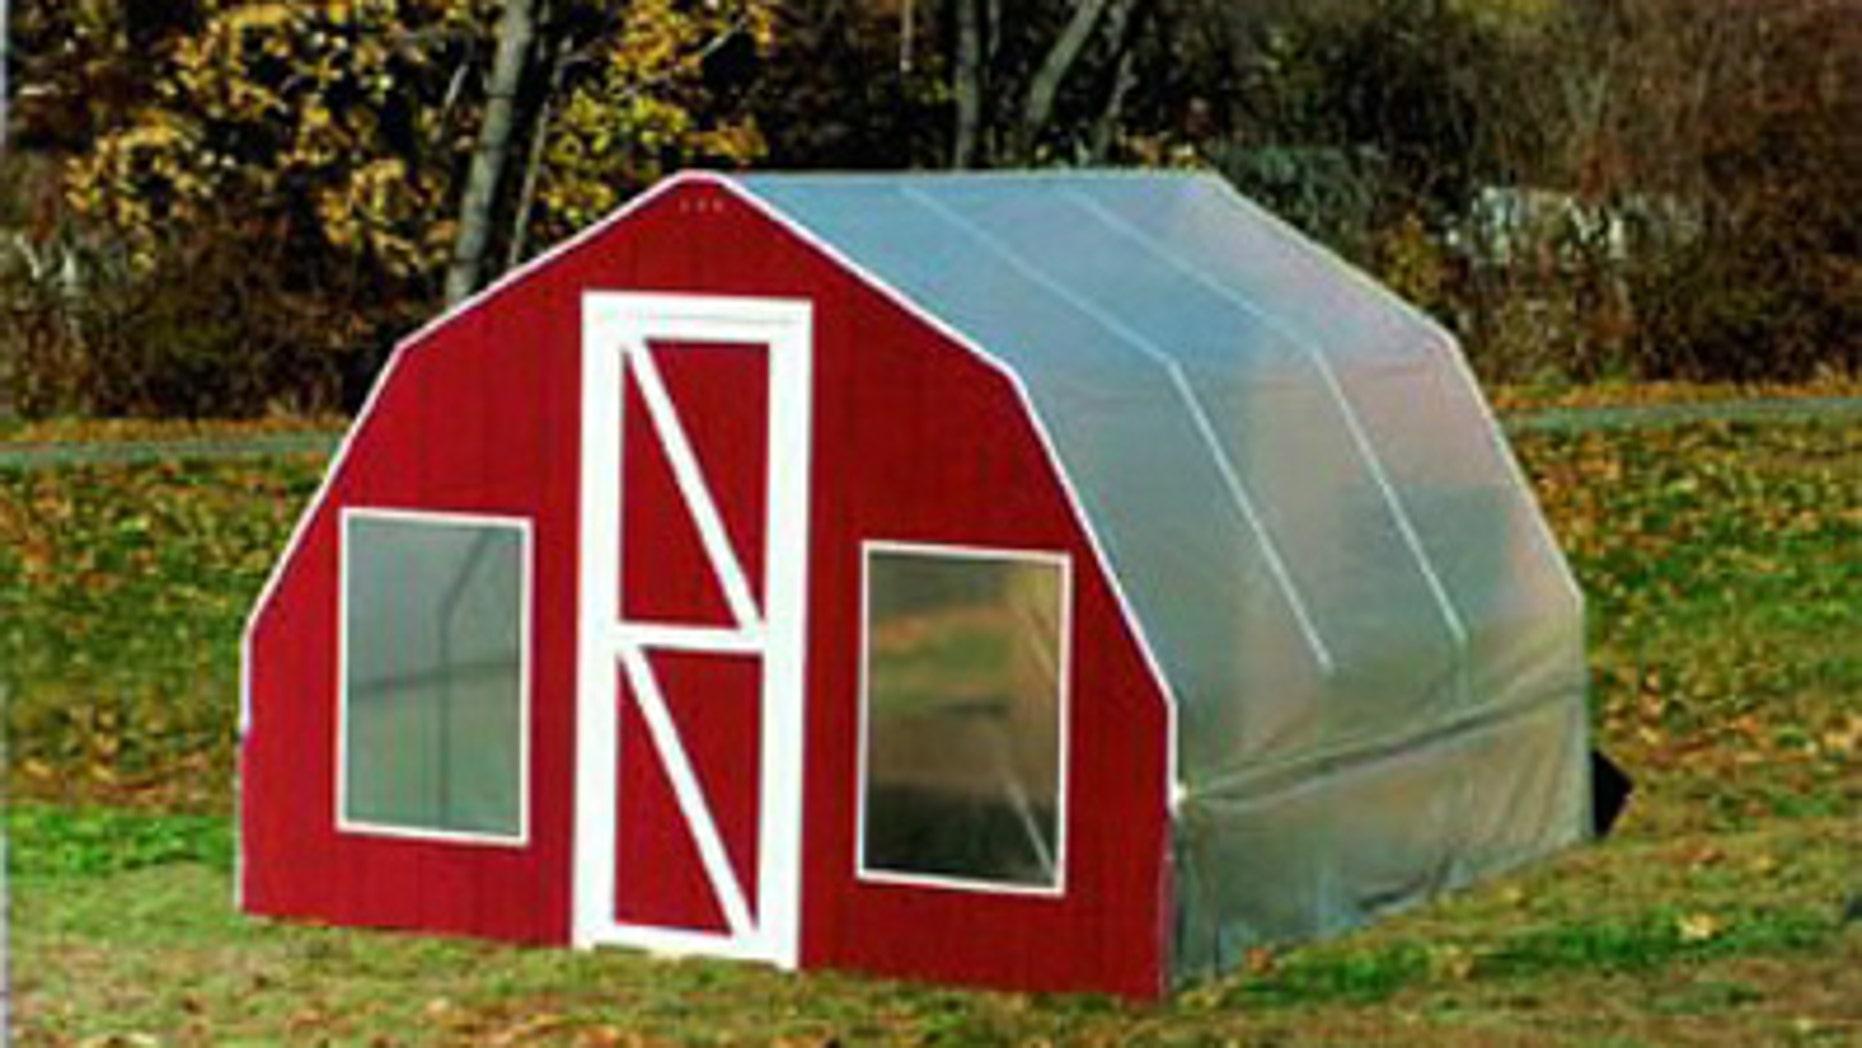 DIY Gardening Project: Build a Hoop House | Fox News